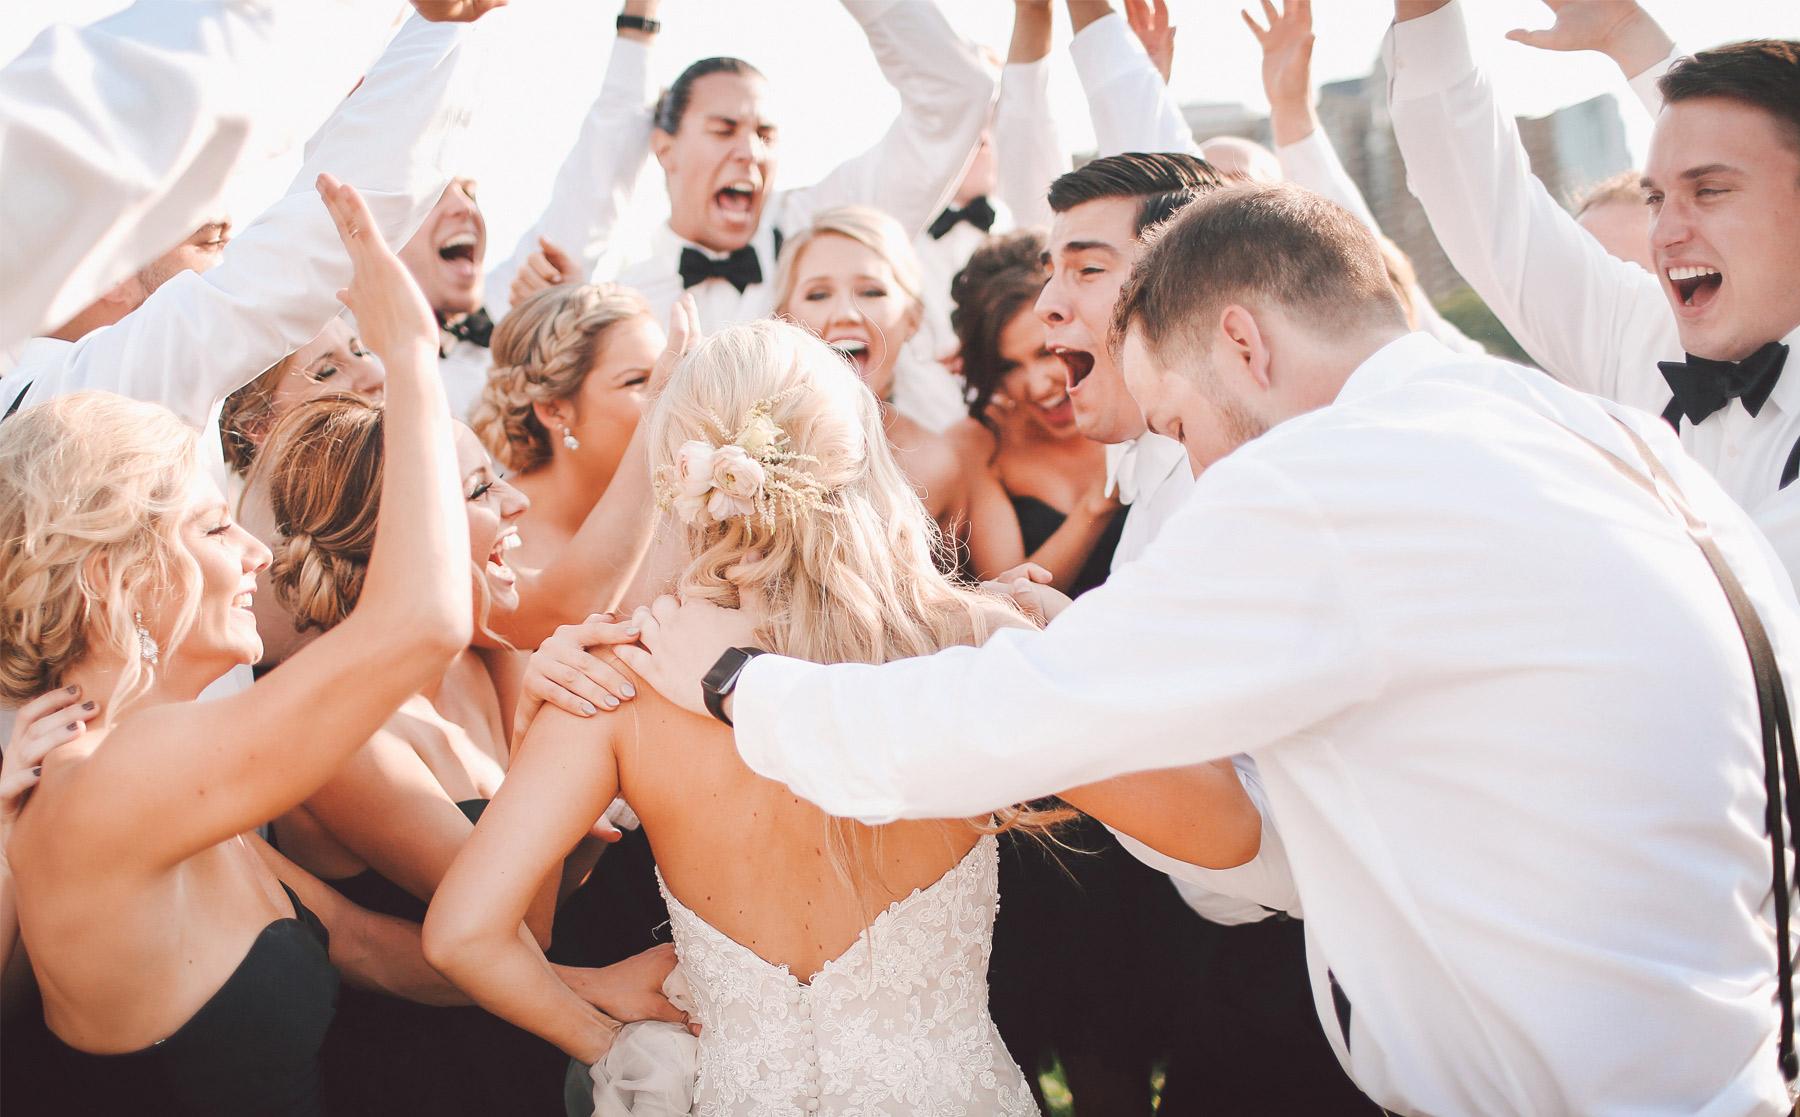 14-Minneapolis-Minnesota-Wedding-Photography-by-Vick-Photography-Aria-Downtown-Industrial-Wedding-Party-Group-Hug-Nikki-and-Scott.jpg